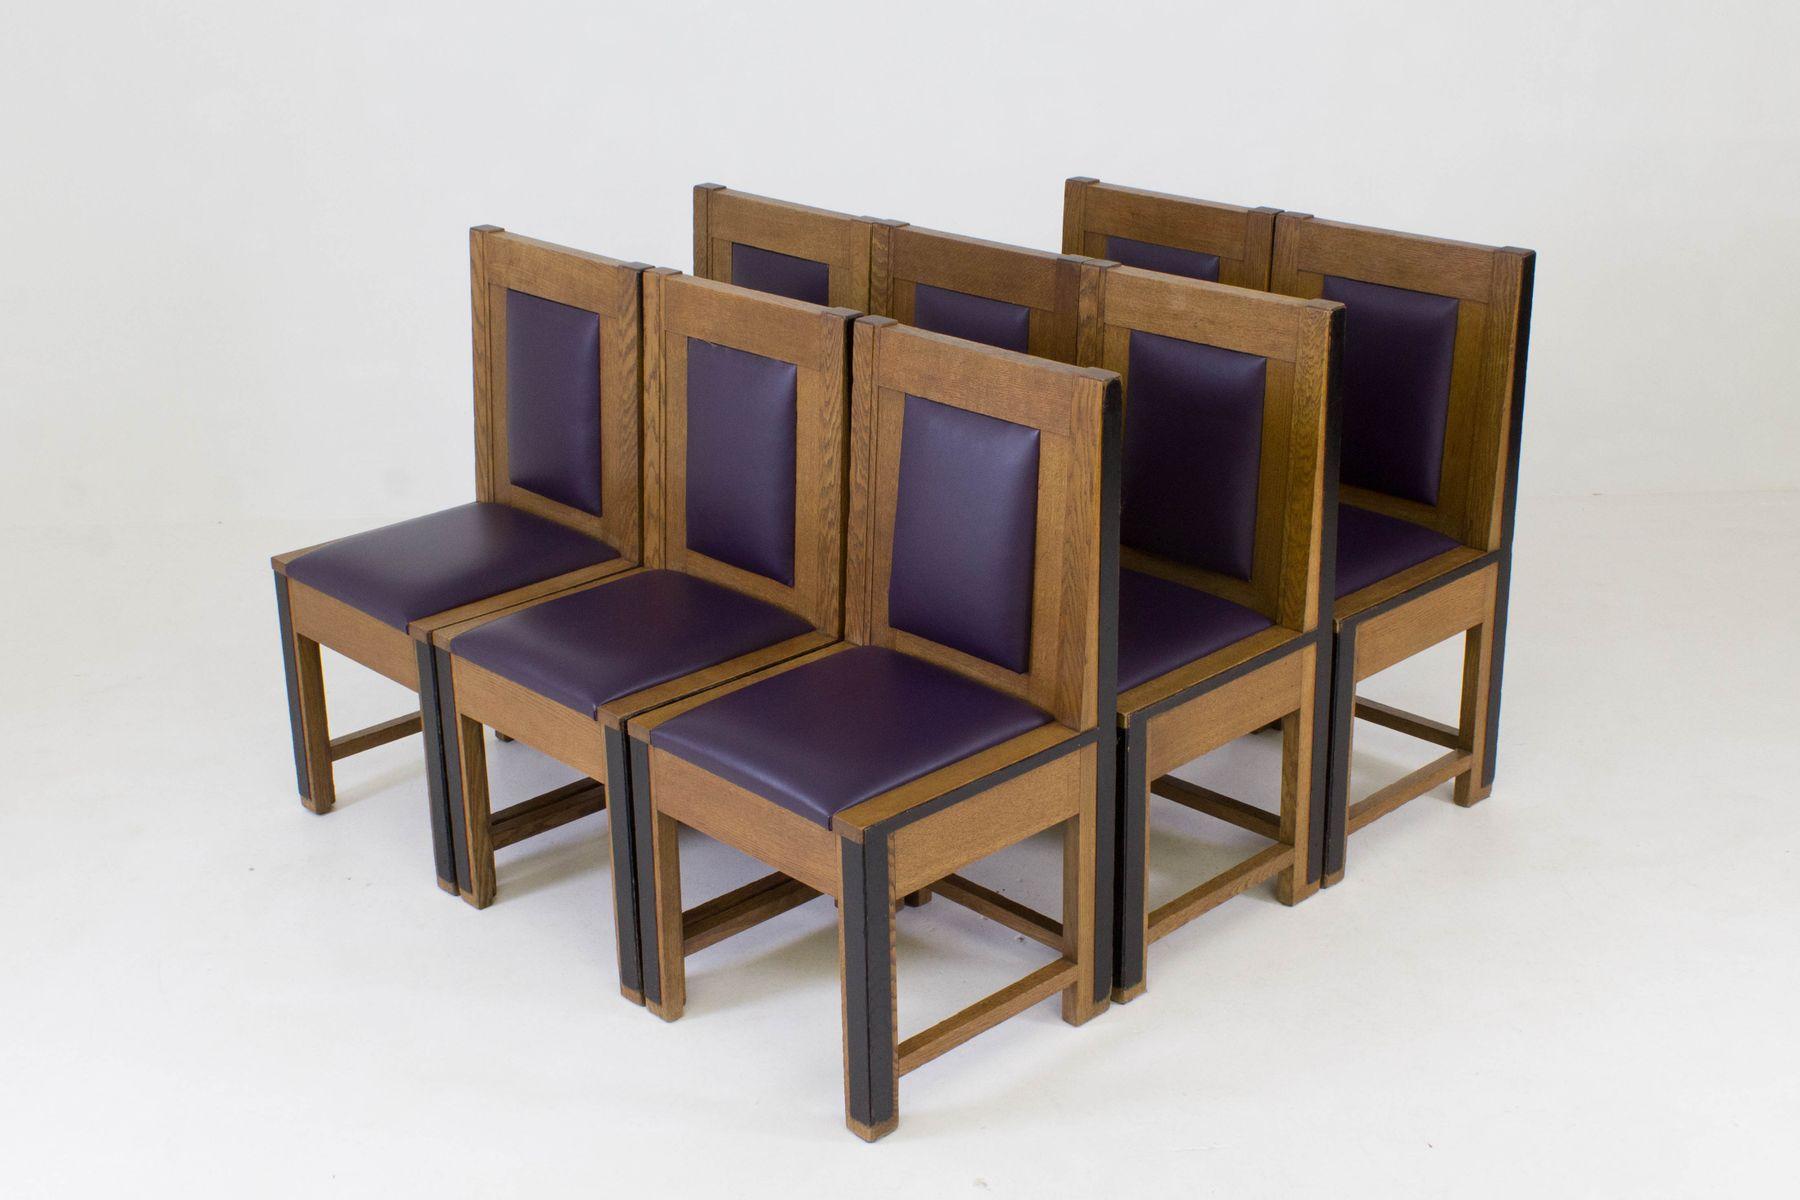 art deco haager schule eichenholz st hle von randoe 1926. Black Bedroom Furniture Sets. Home Design Ideas